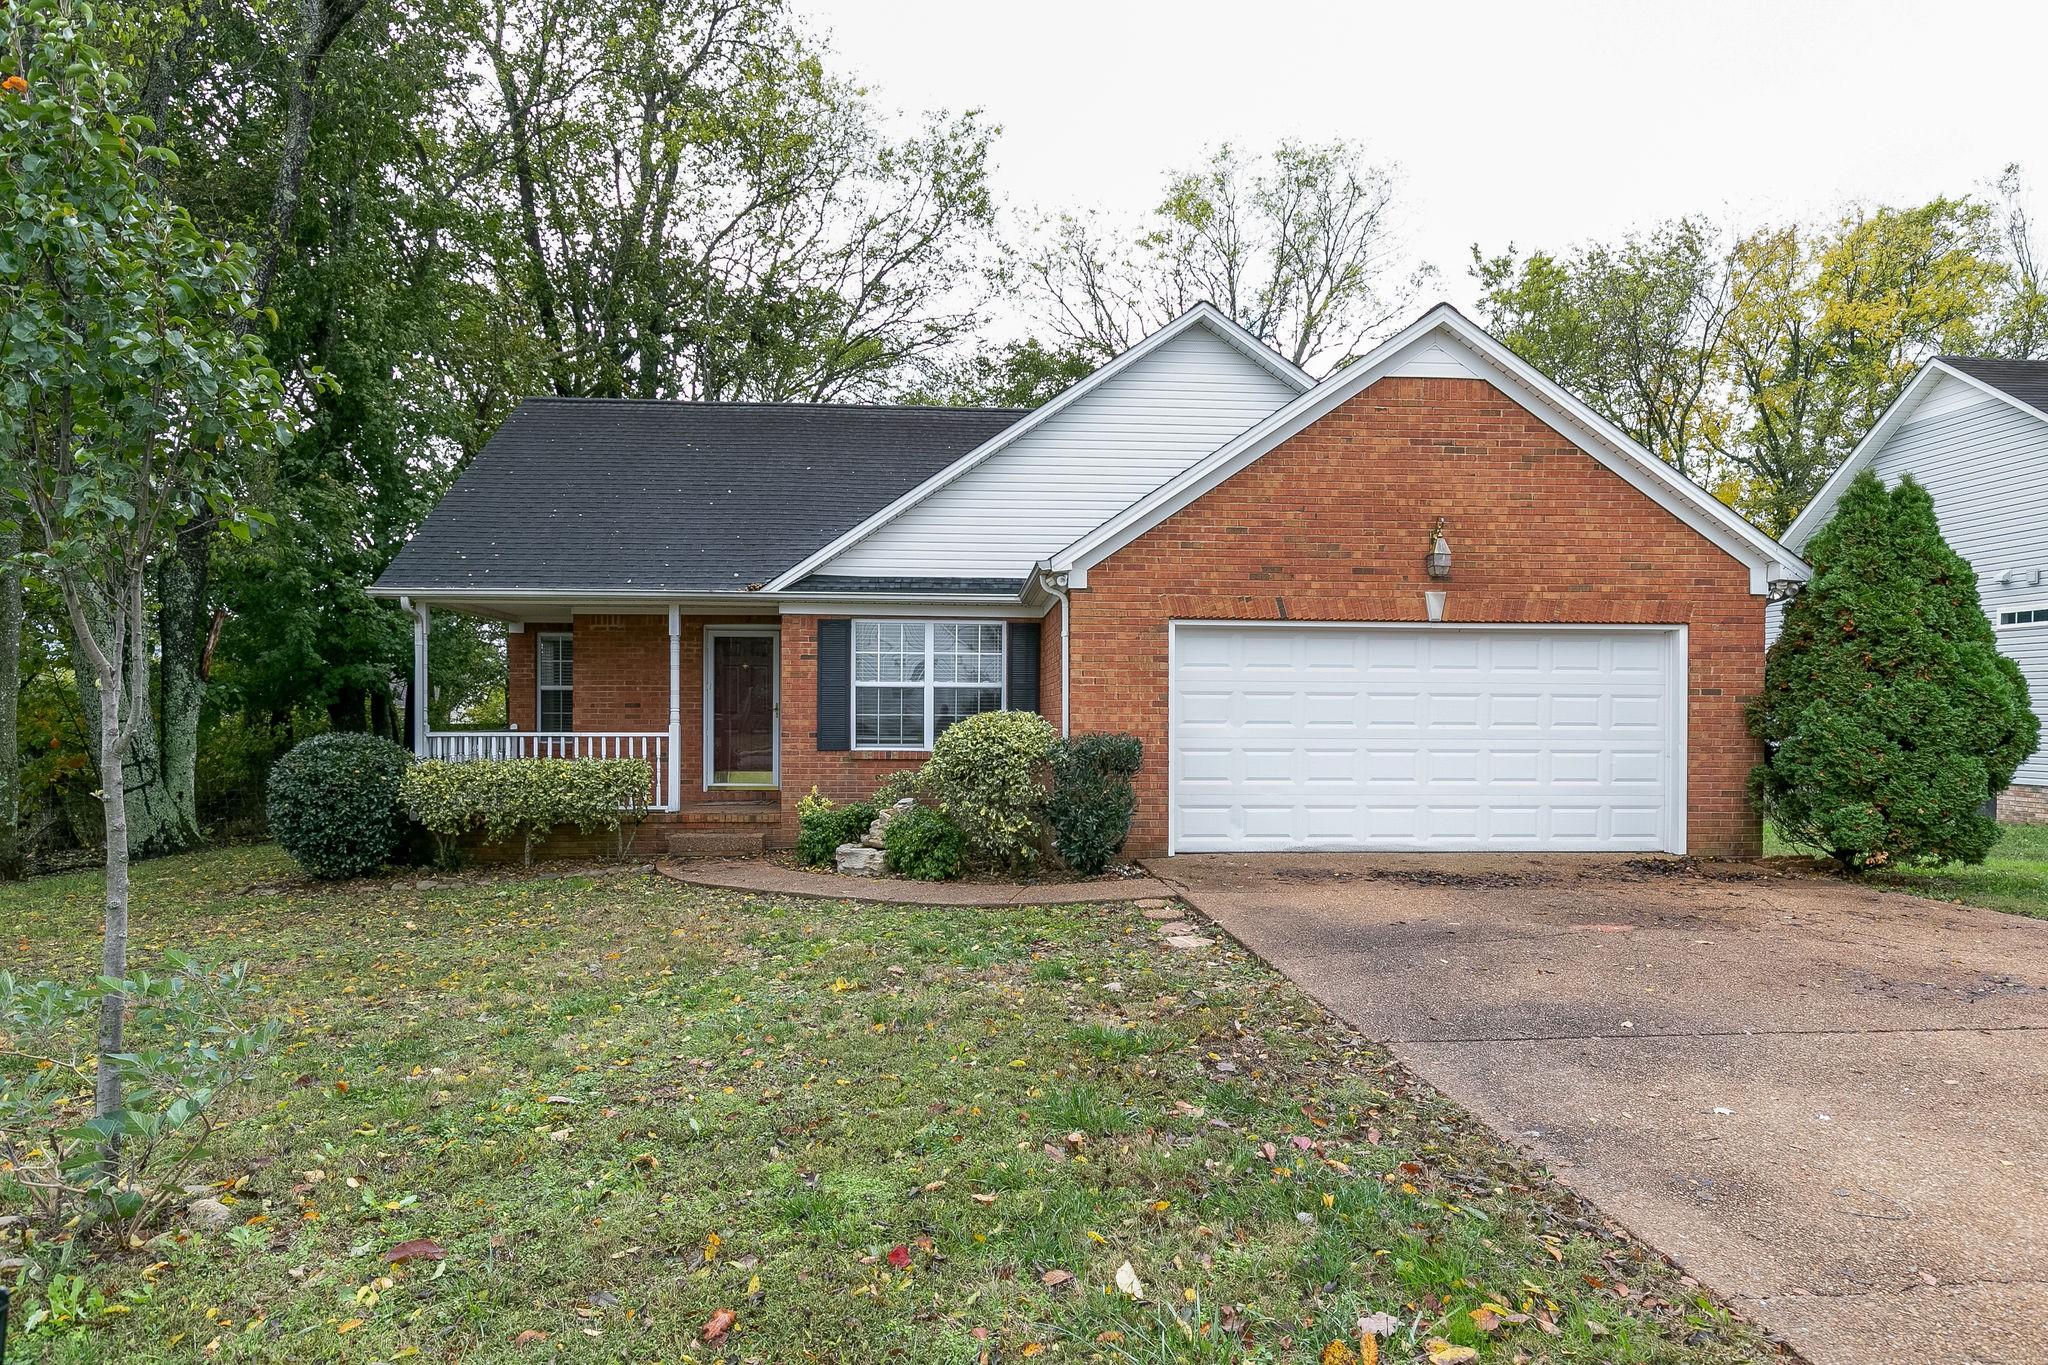 2099 Prescott Way, Spring Hill in Williamson County County, TN 37174 Home for Sale